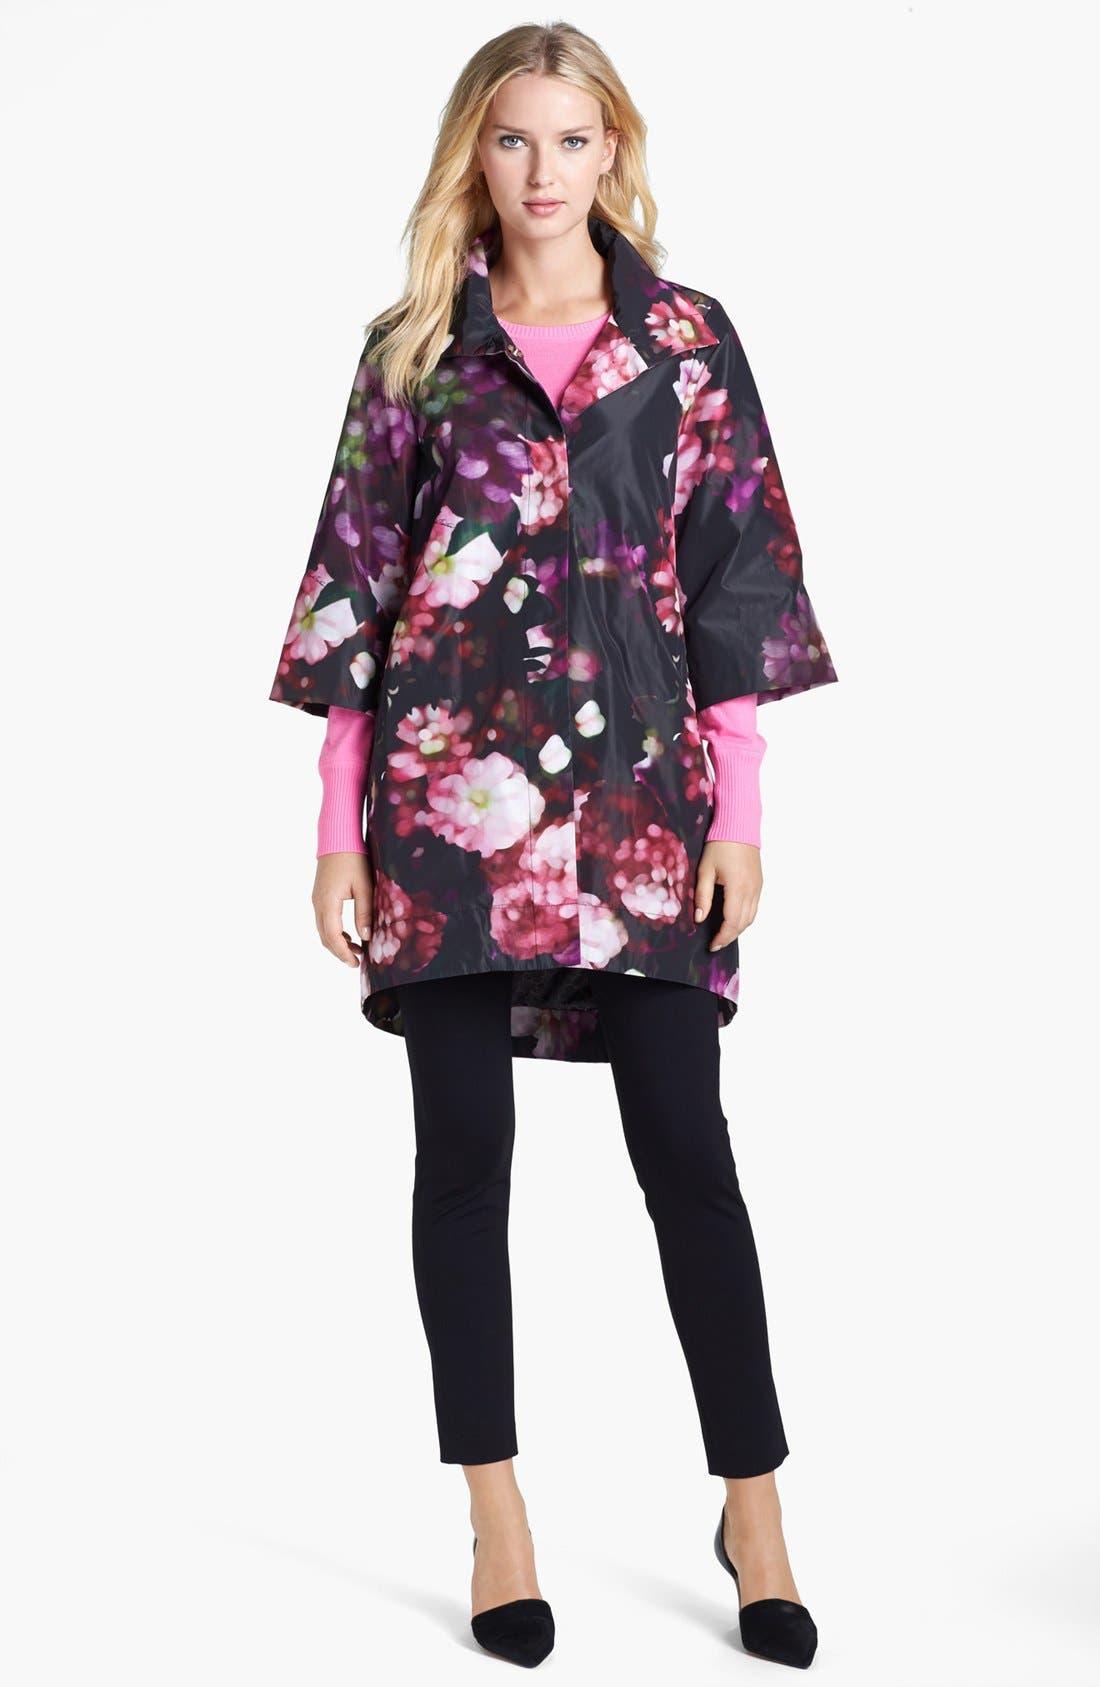 Main Image - Pink Tartan Swing Coat & Cashmere Sweater, Elie Tahari Knit Pants